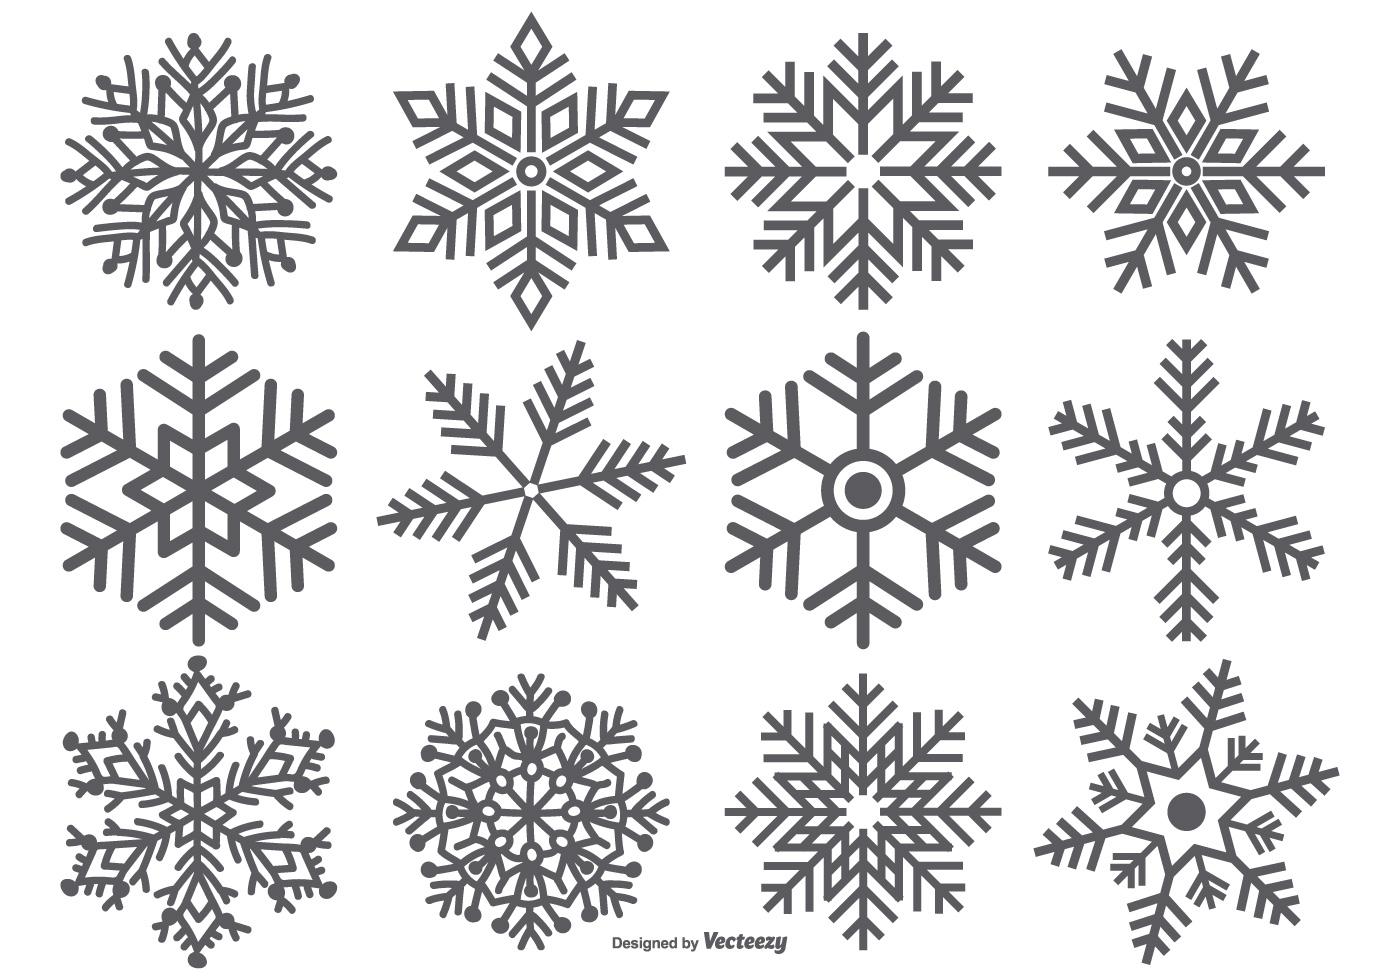 Snowflake Free Vector Art